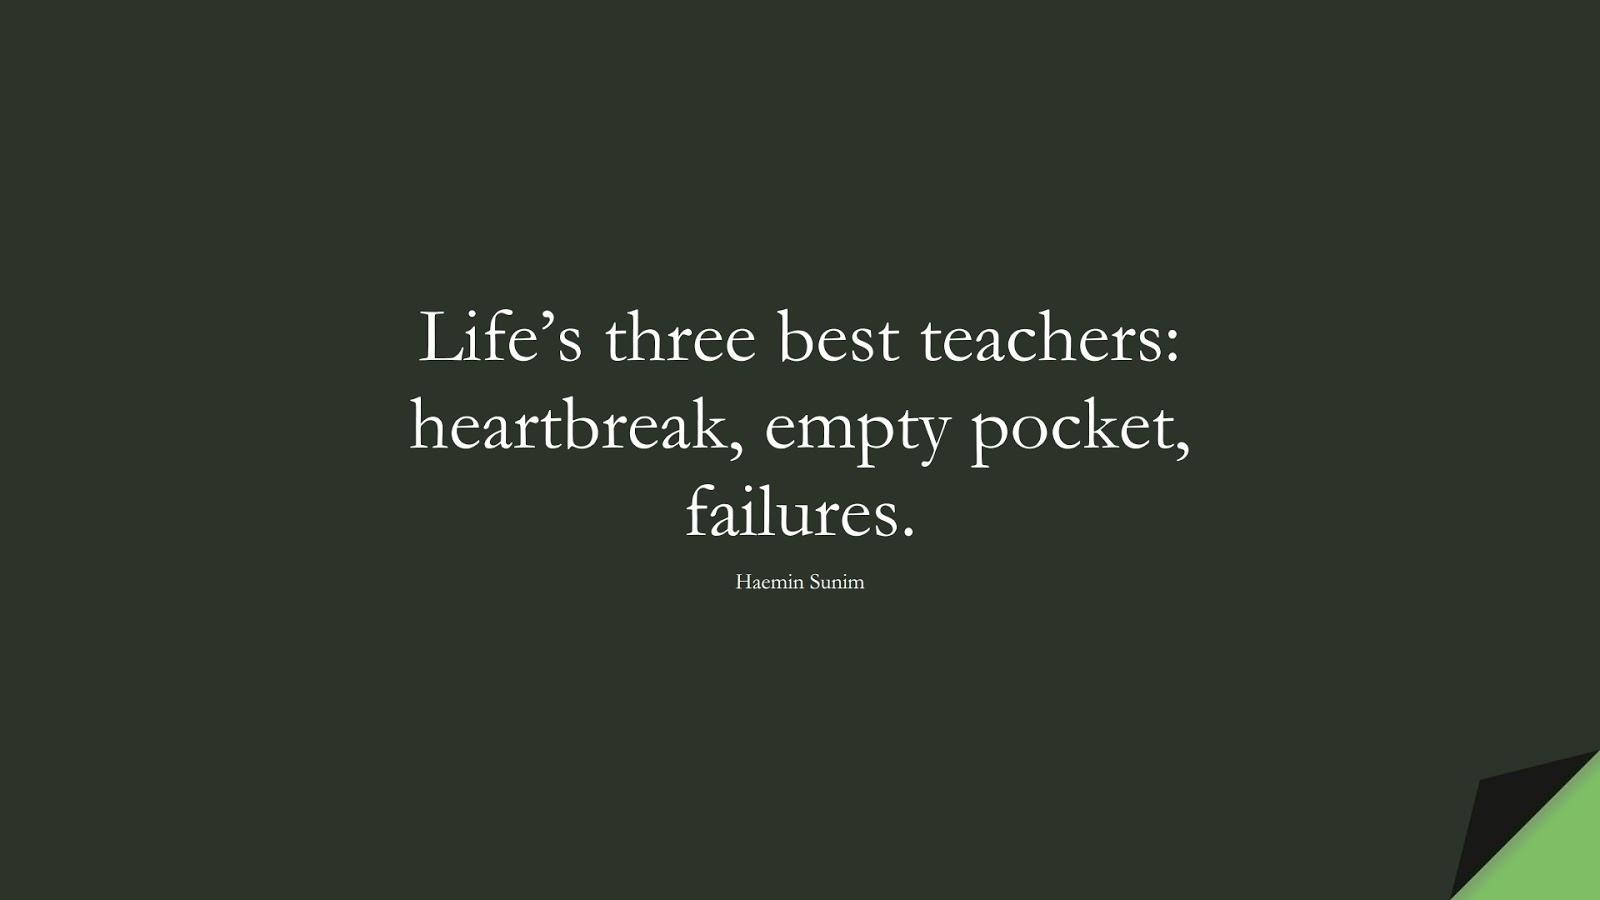 Life's three best teachers: heartbreak, empty pocket, failures. (Haemin Sunim);  #StoicQuotes